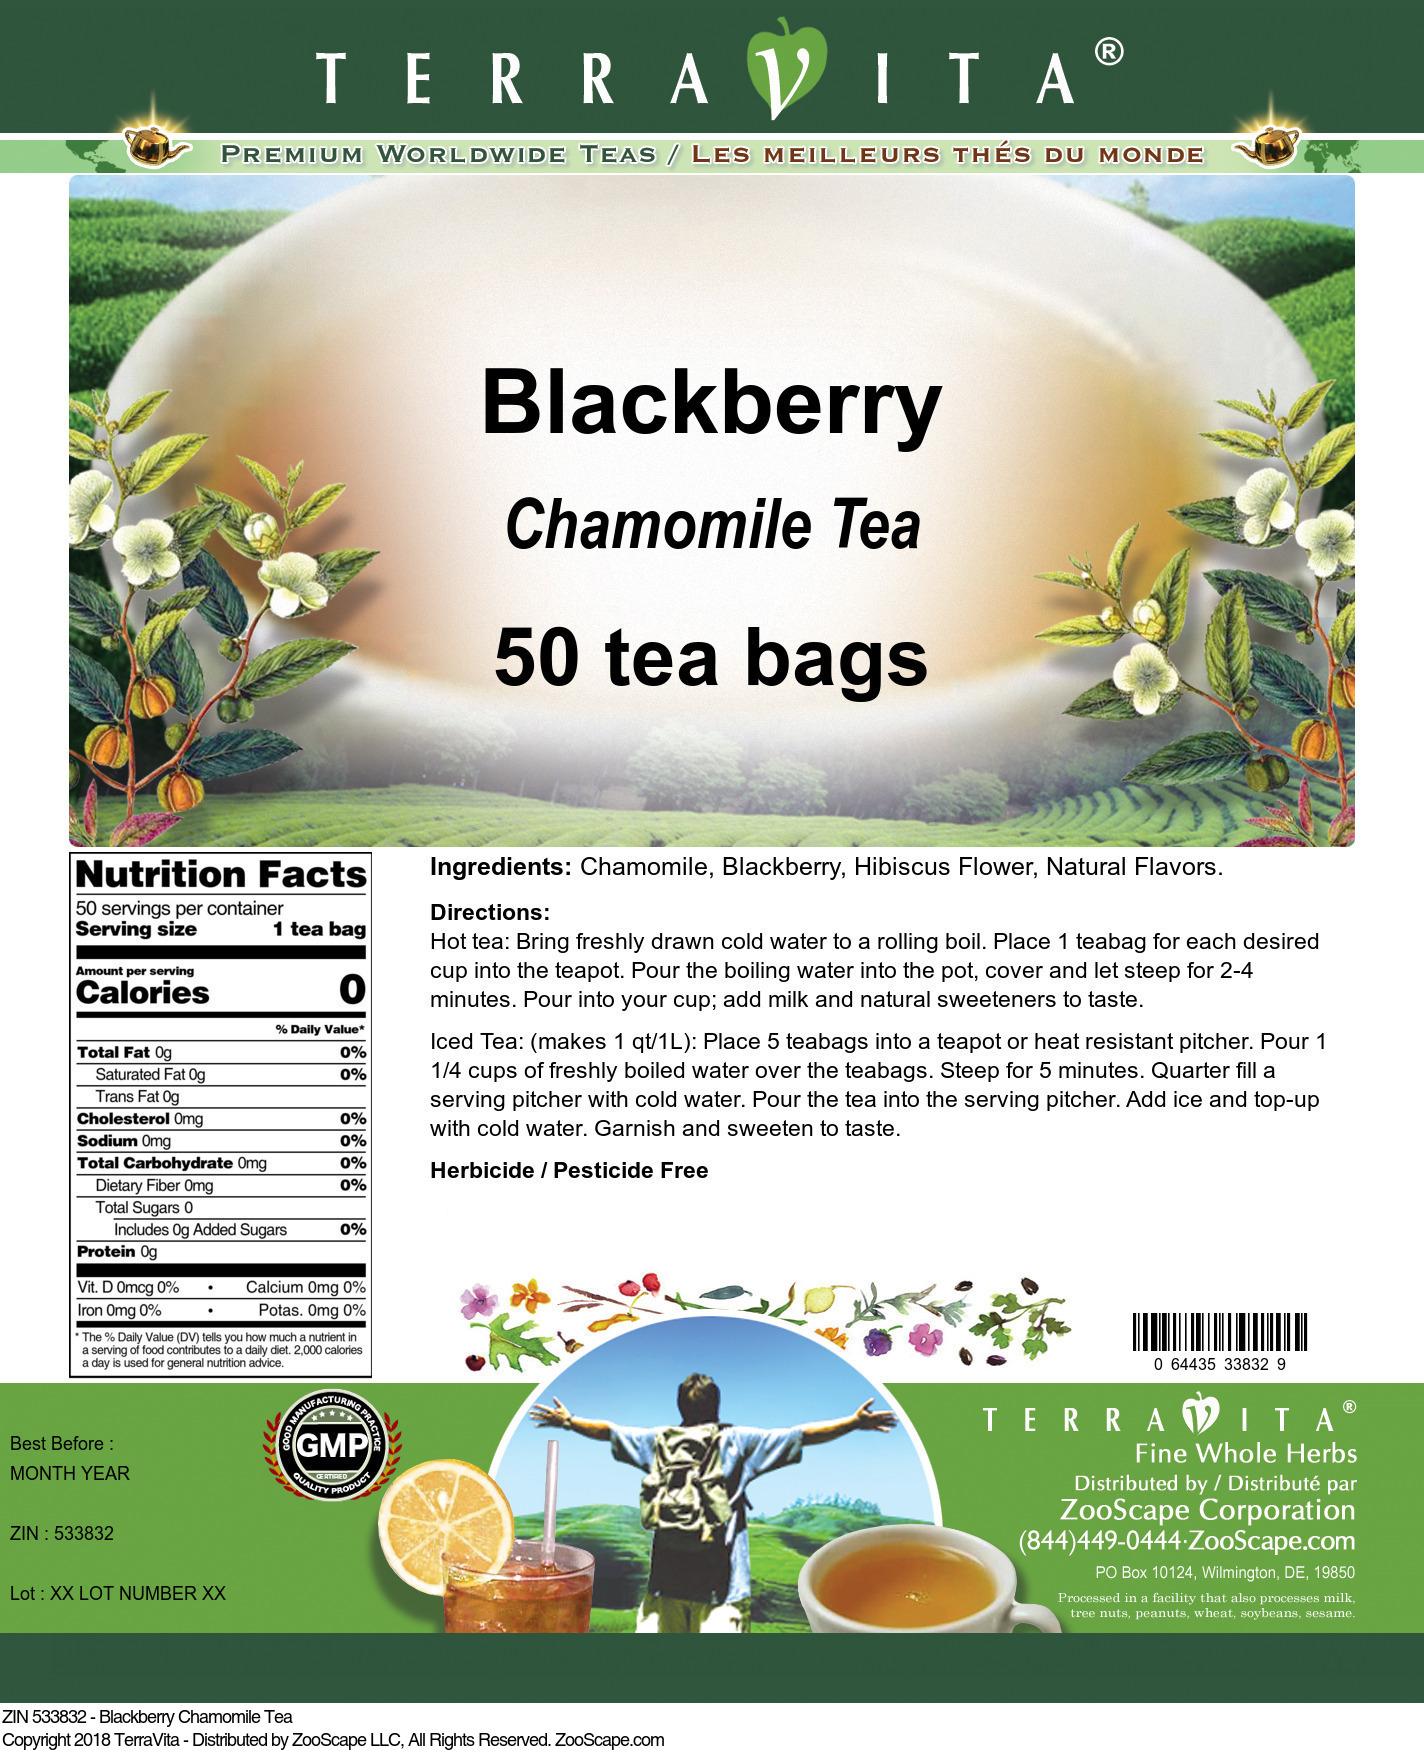 Blackberry Chamomile Tea